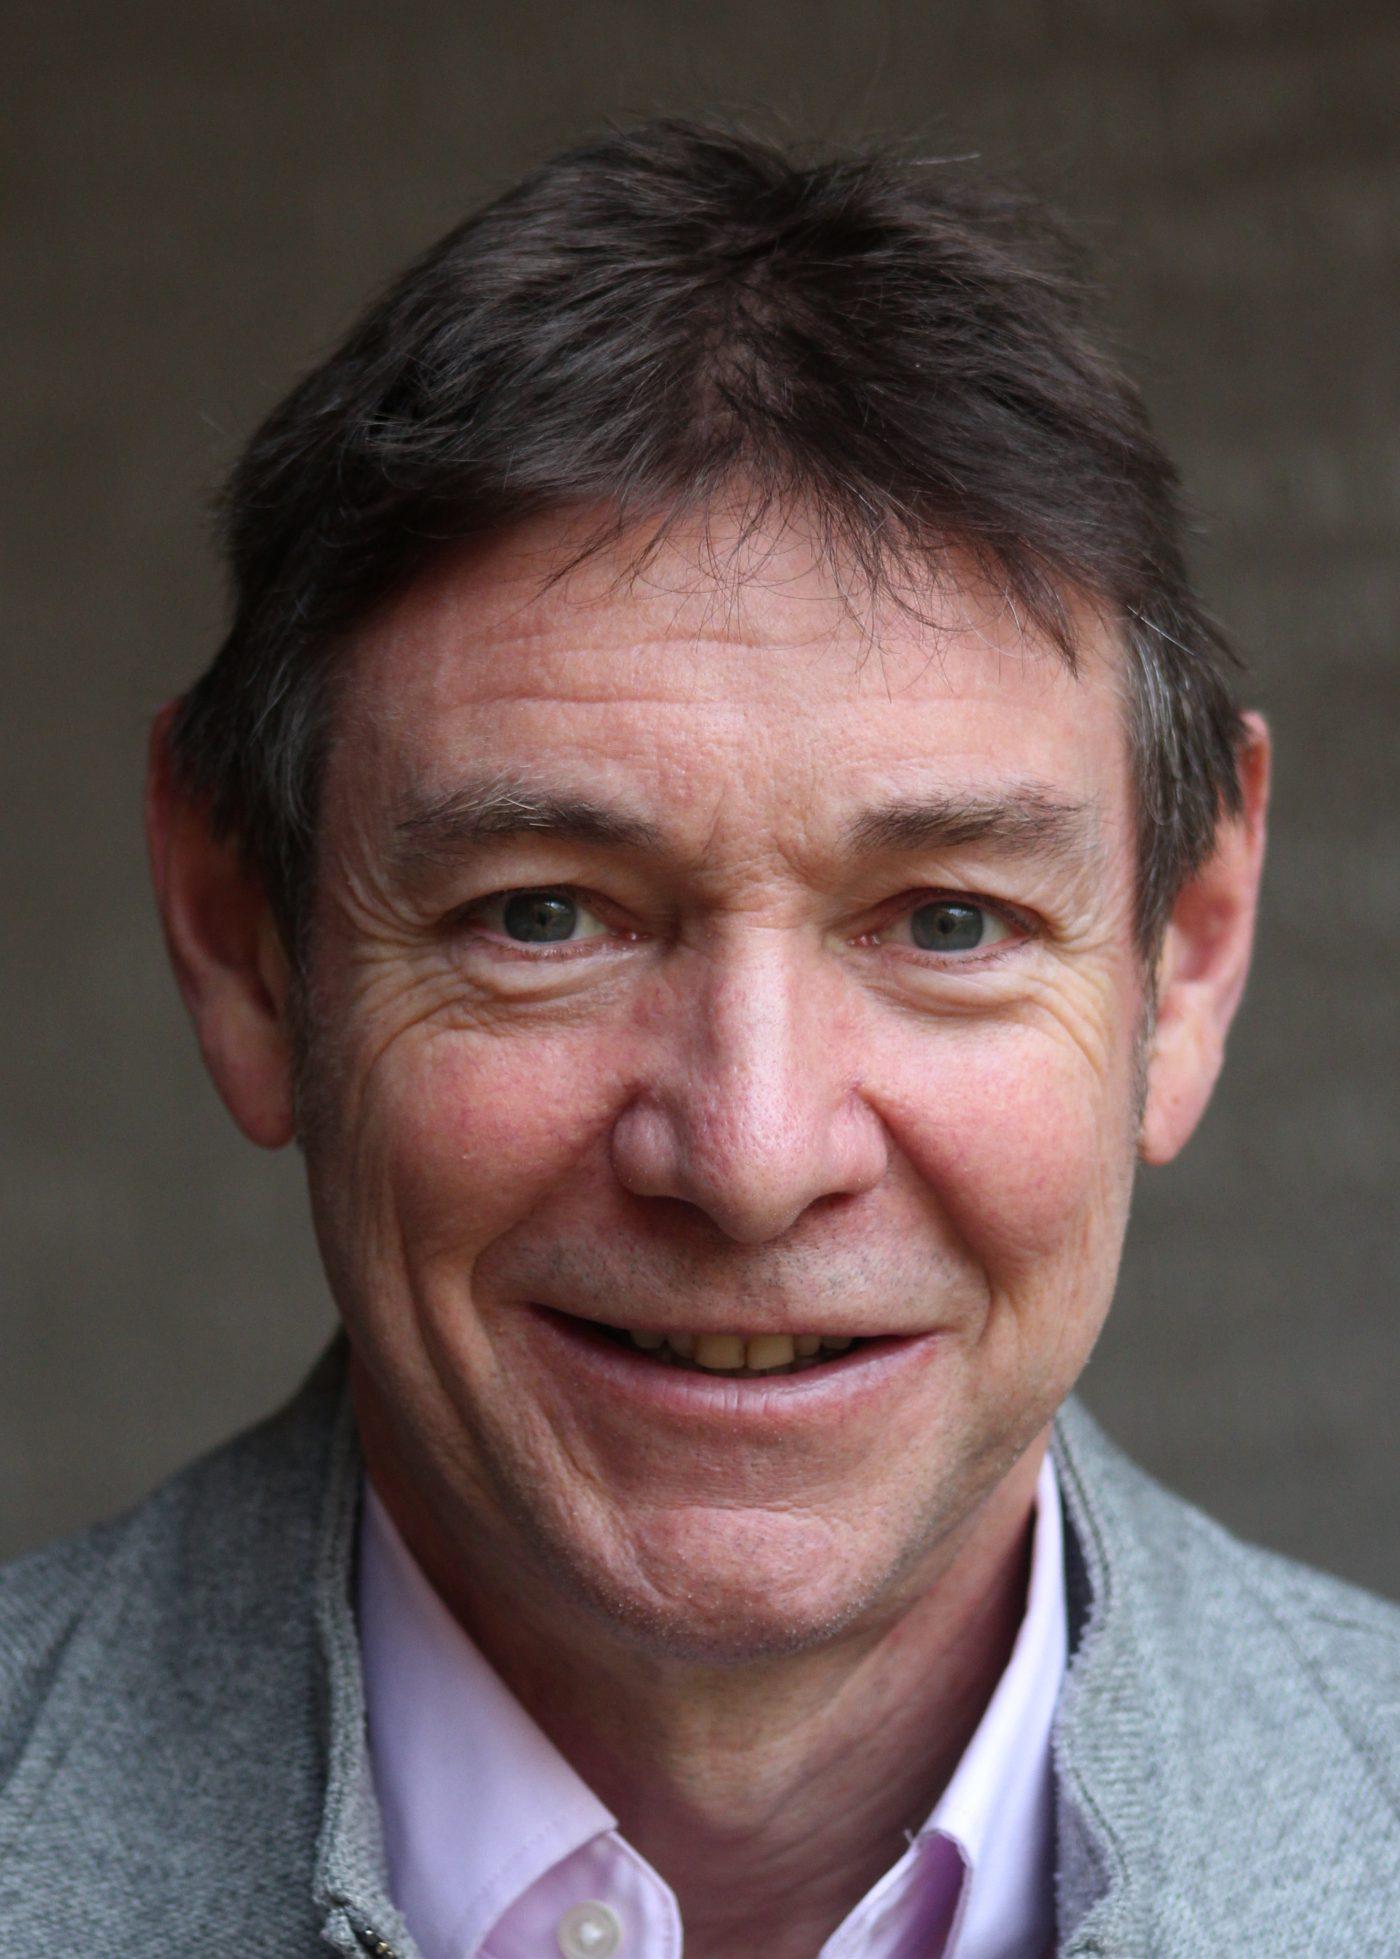 Mr Simon Brewster